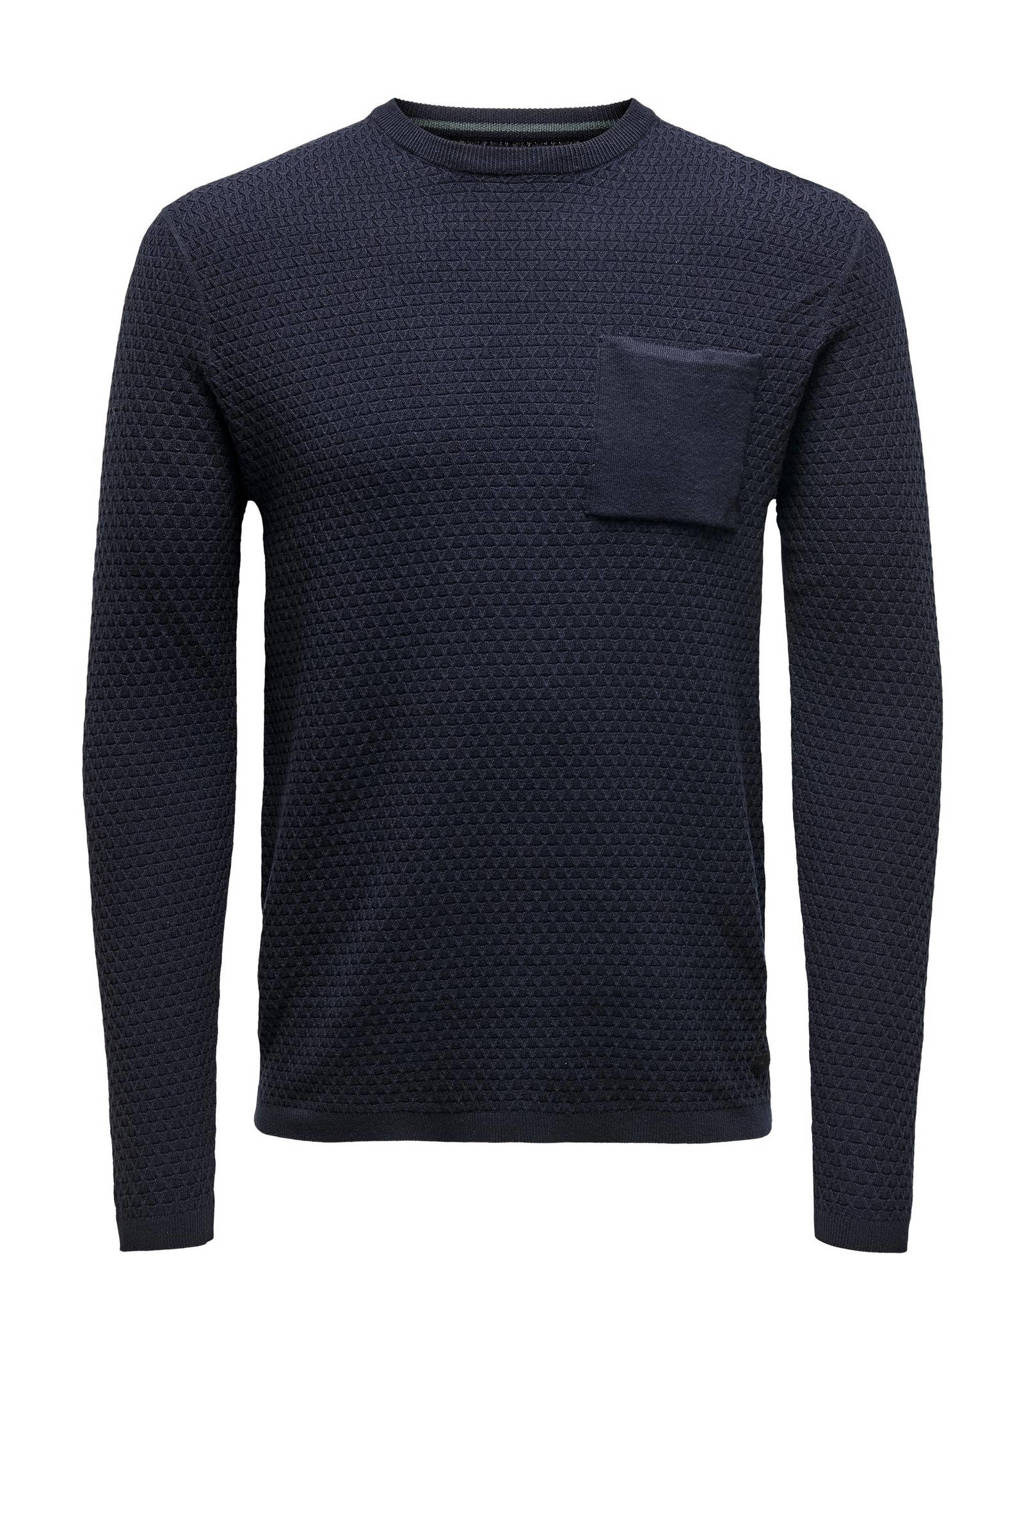 ONLY & SONS trui met textuur donkerblauw, Donkerblauw